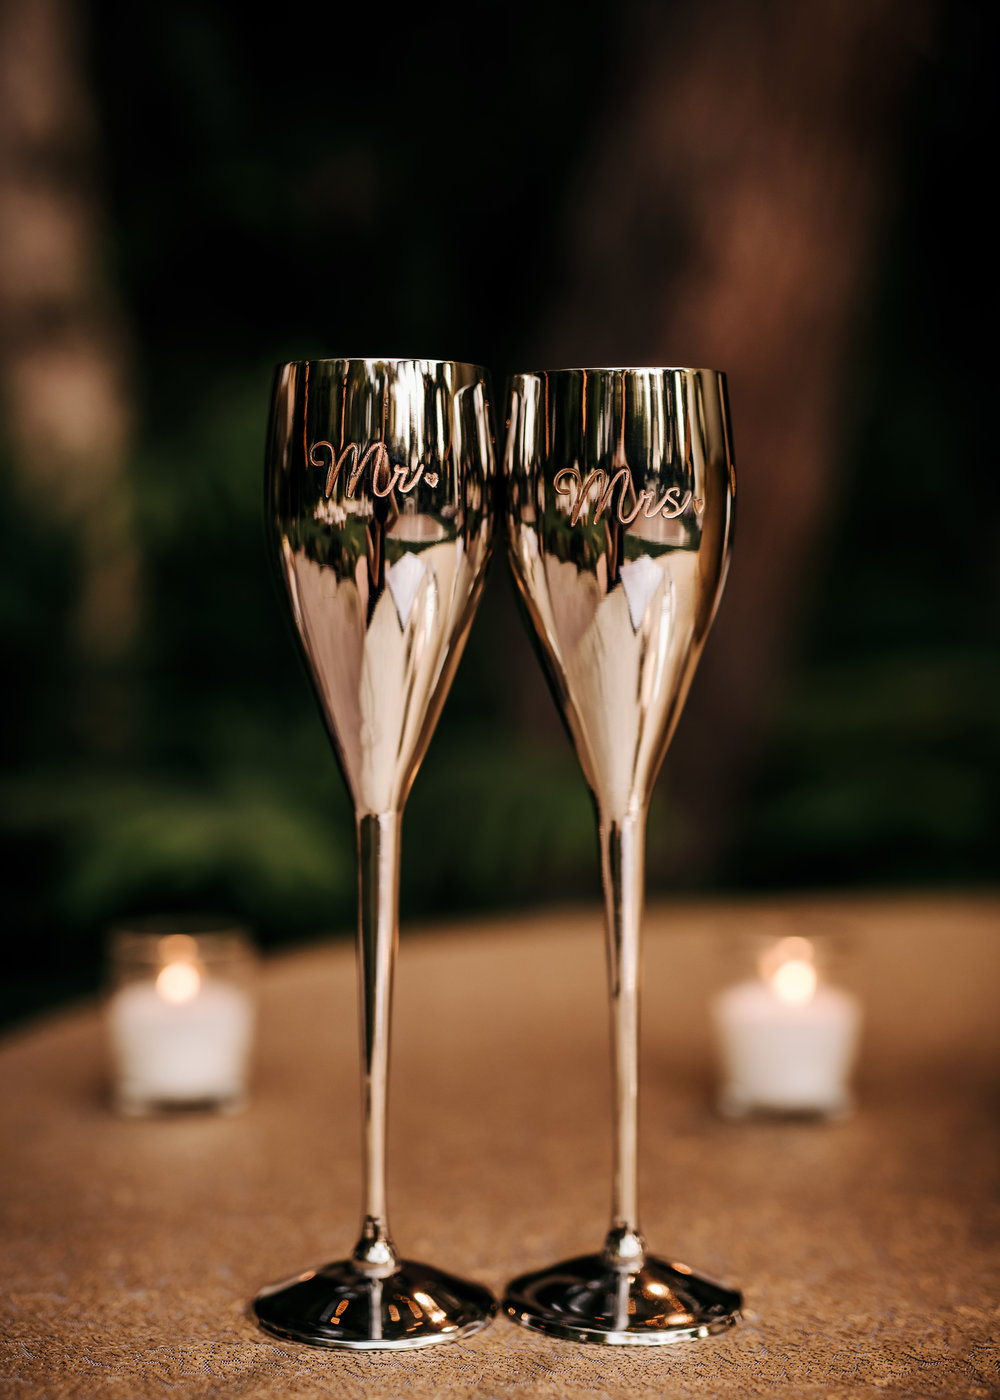 Turchin_20180825_Austinae-Brent-Wedding_451.jpg